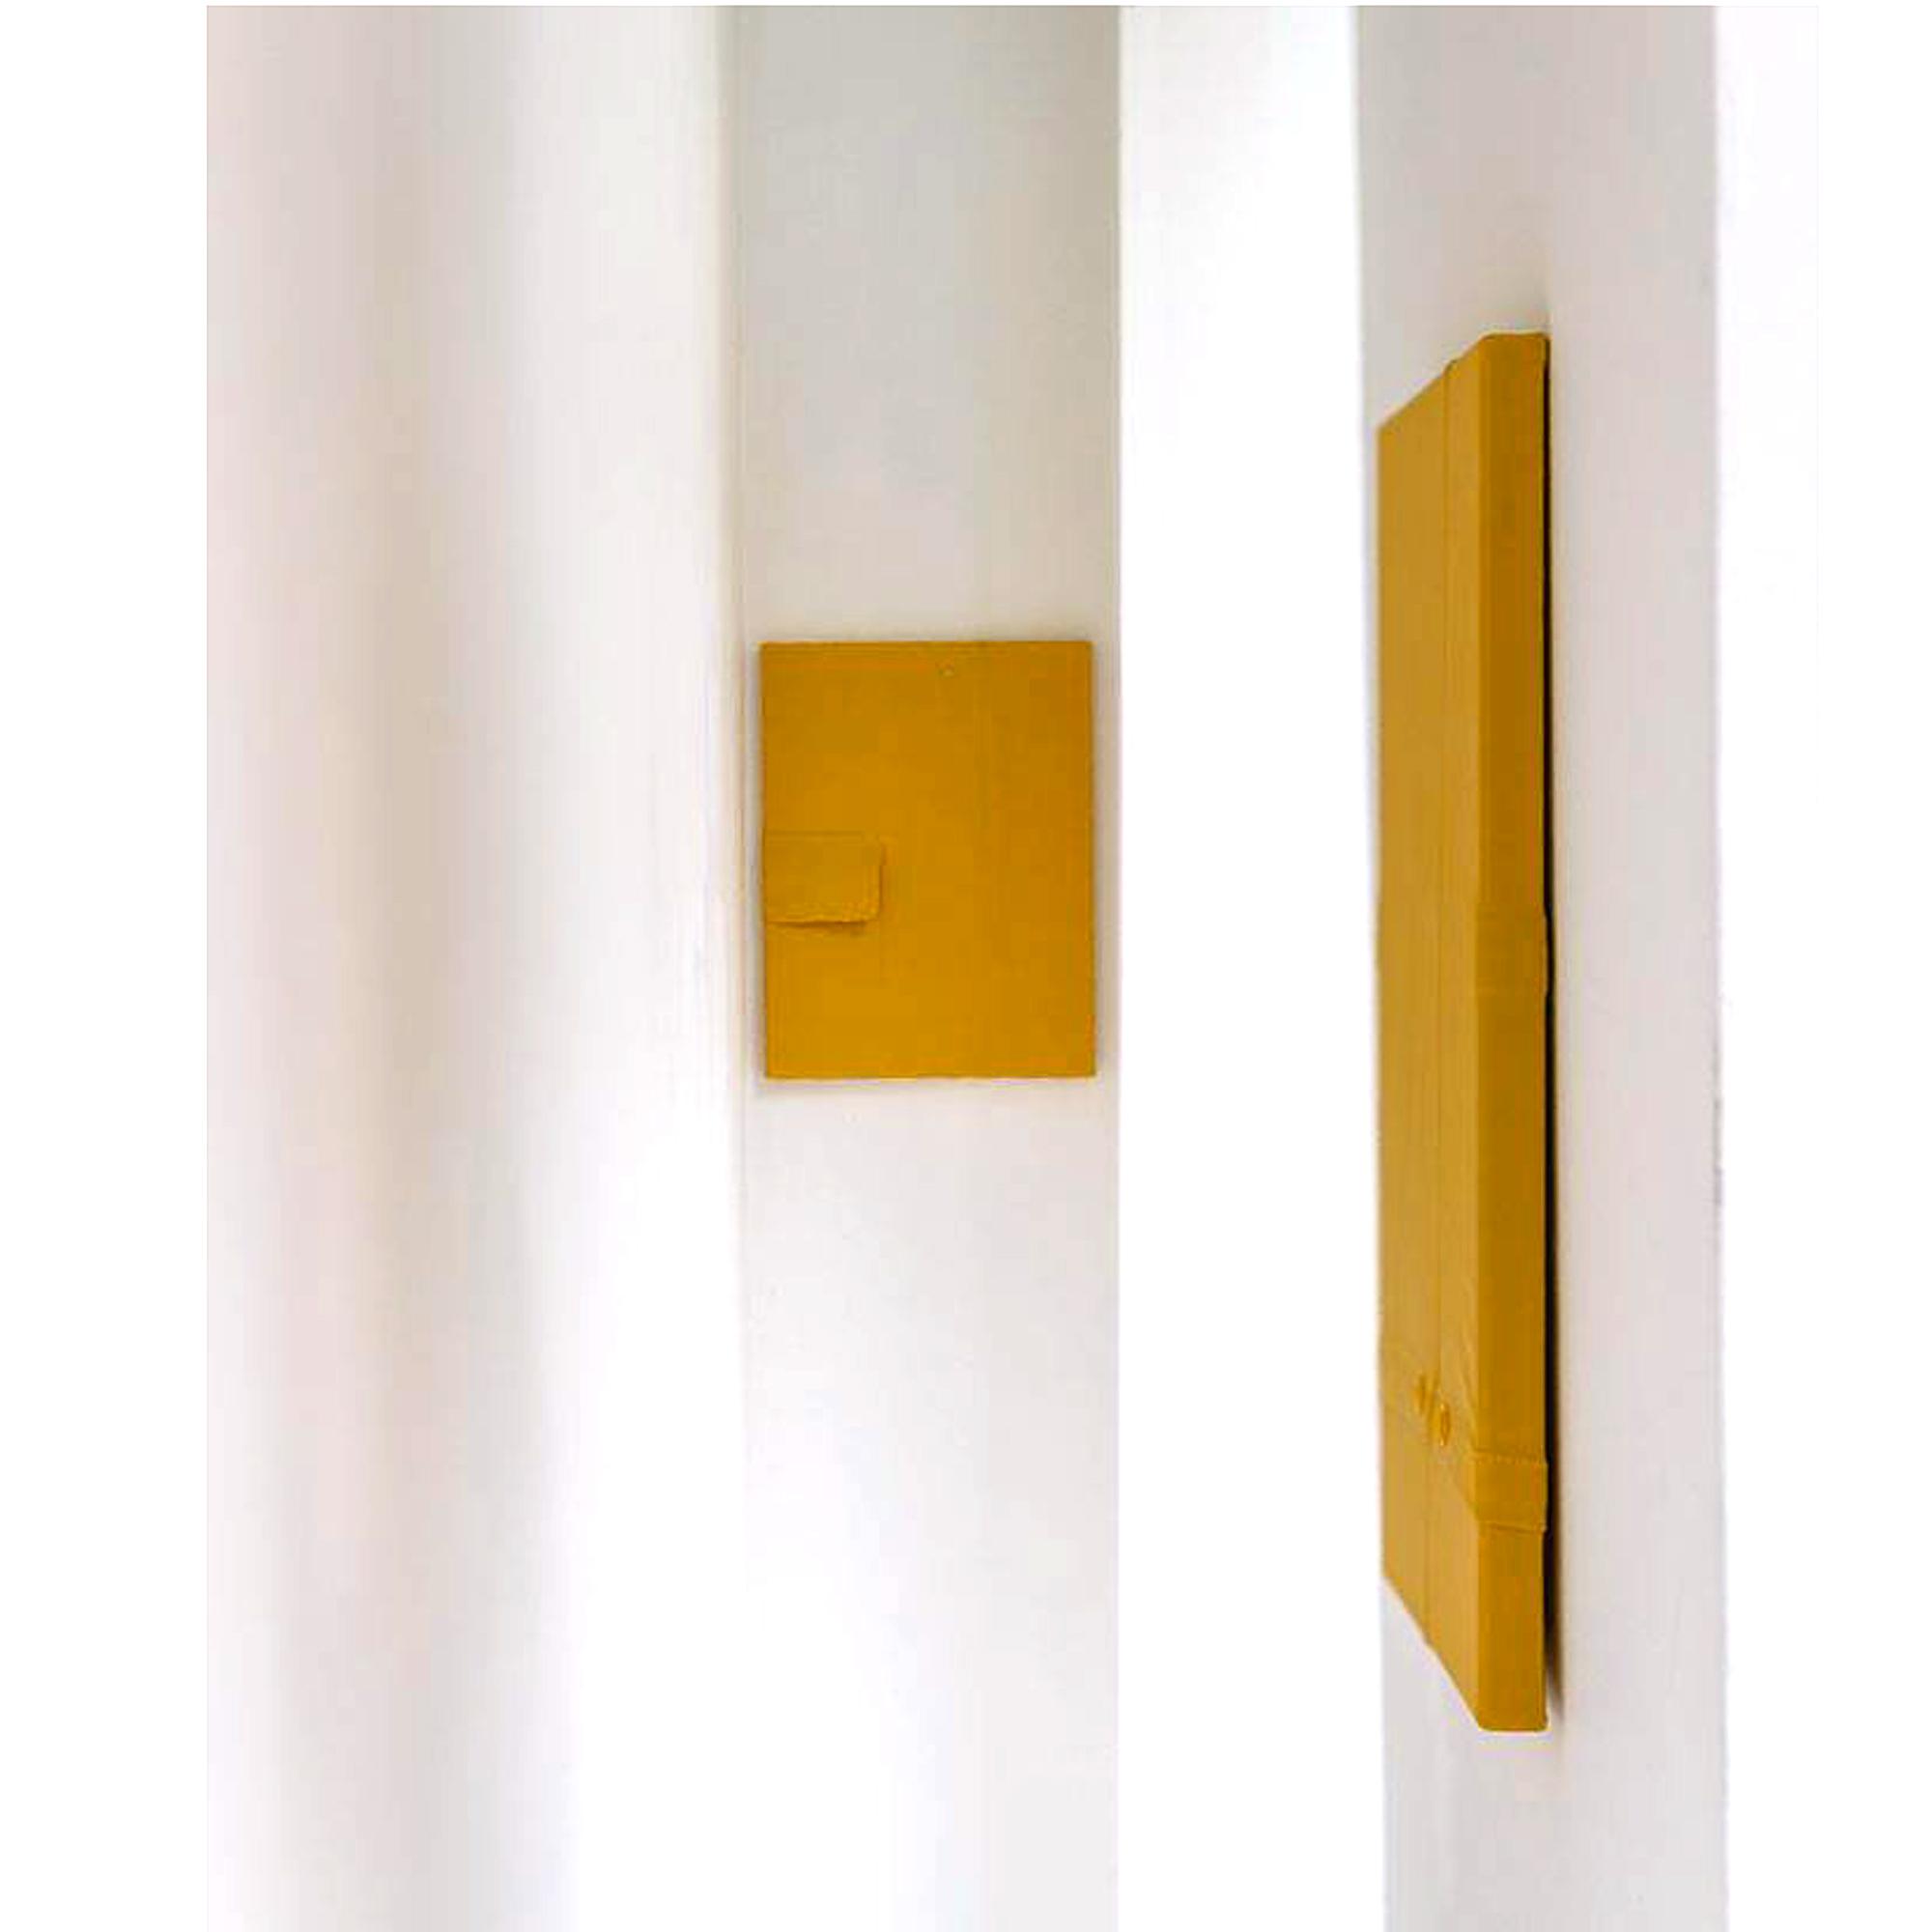 SAMUEL FRANÇOIS  Morgan Concrete Art Advisory London MCAAL 1.jpg